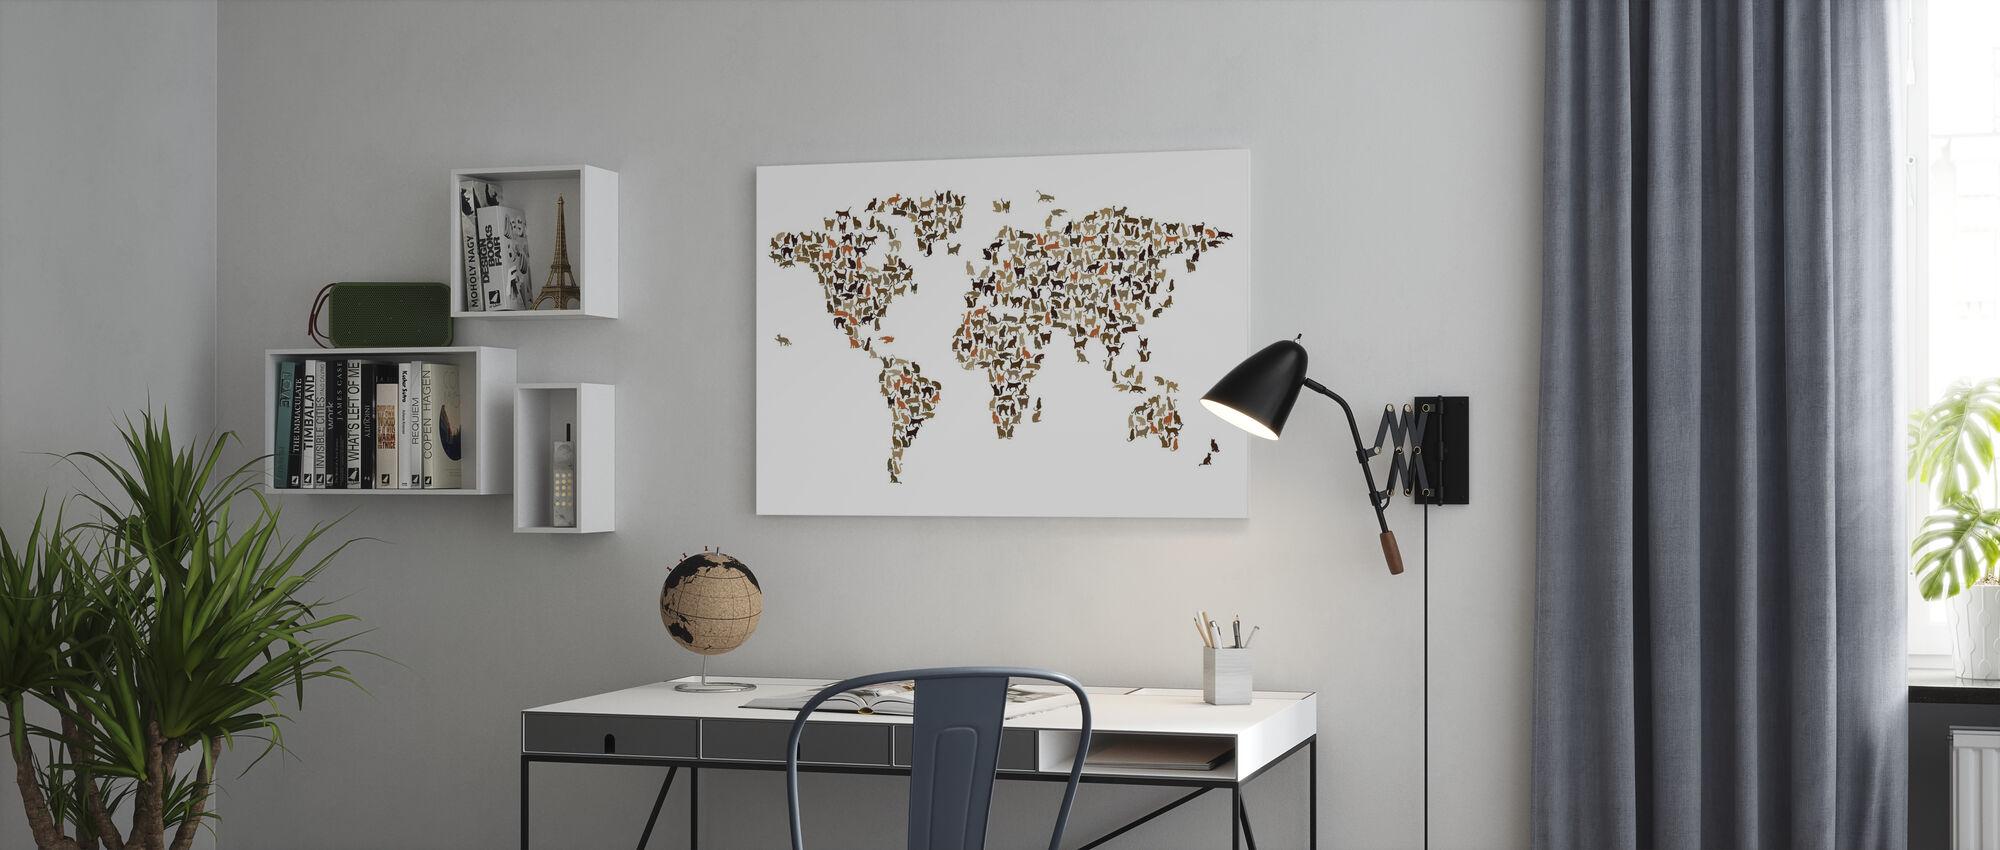 Katter World Kort - Lerretsbilde - Kontor